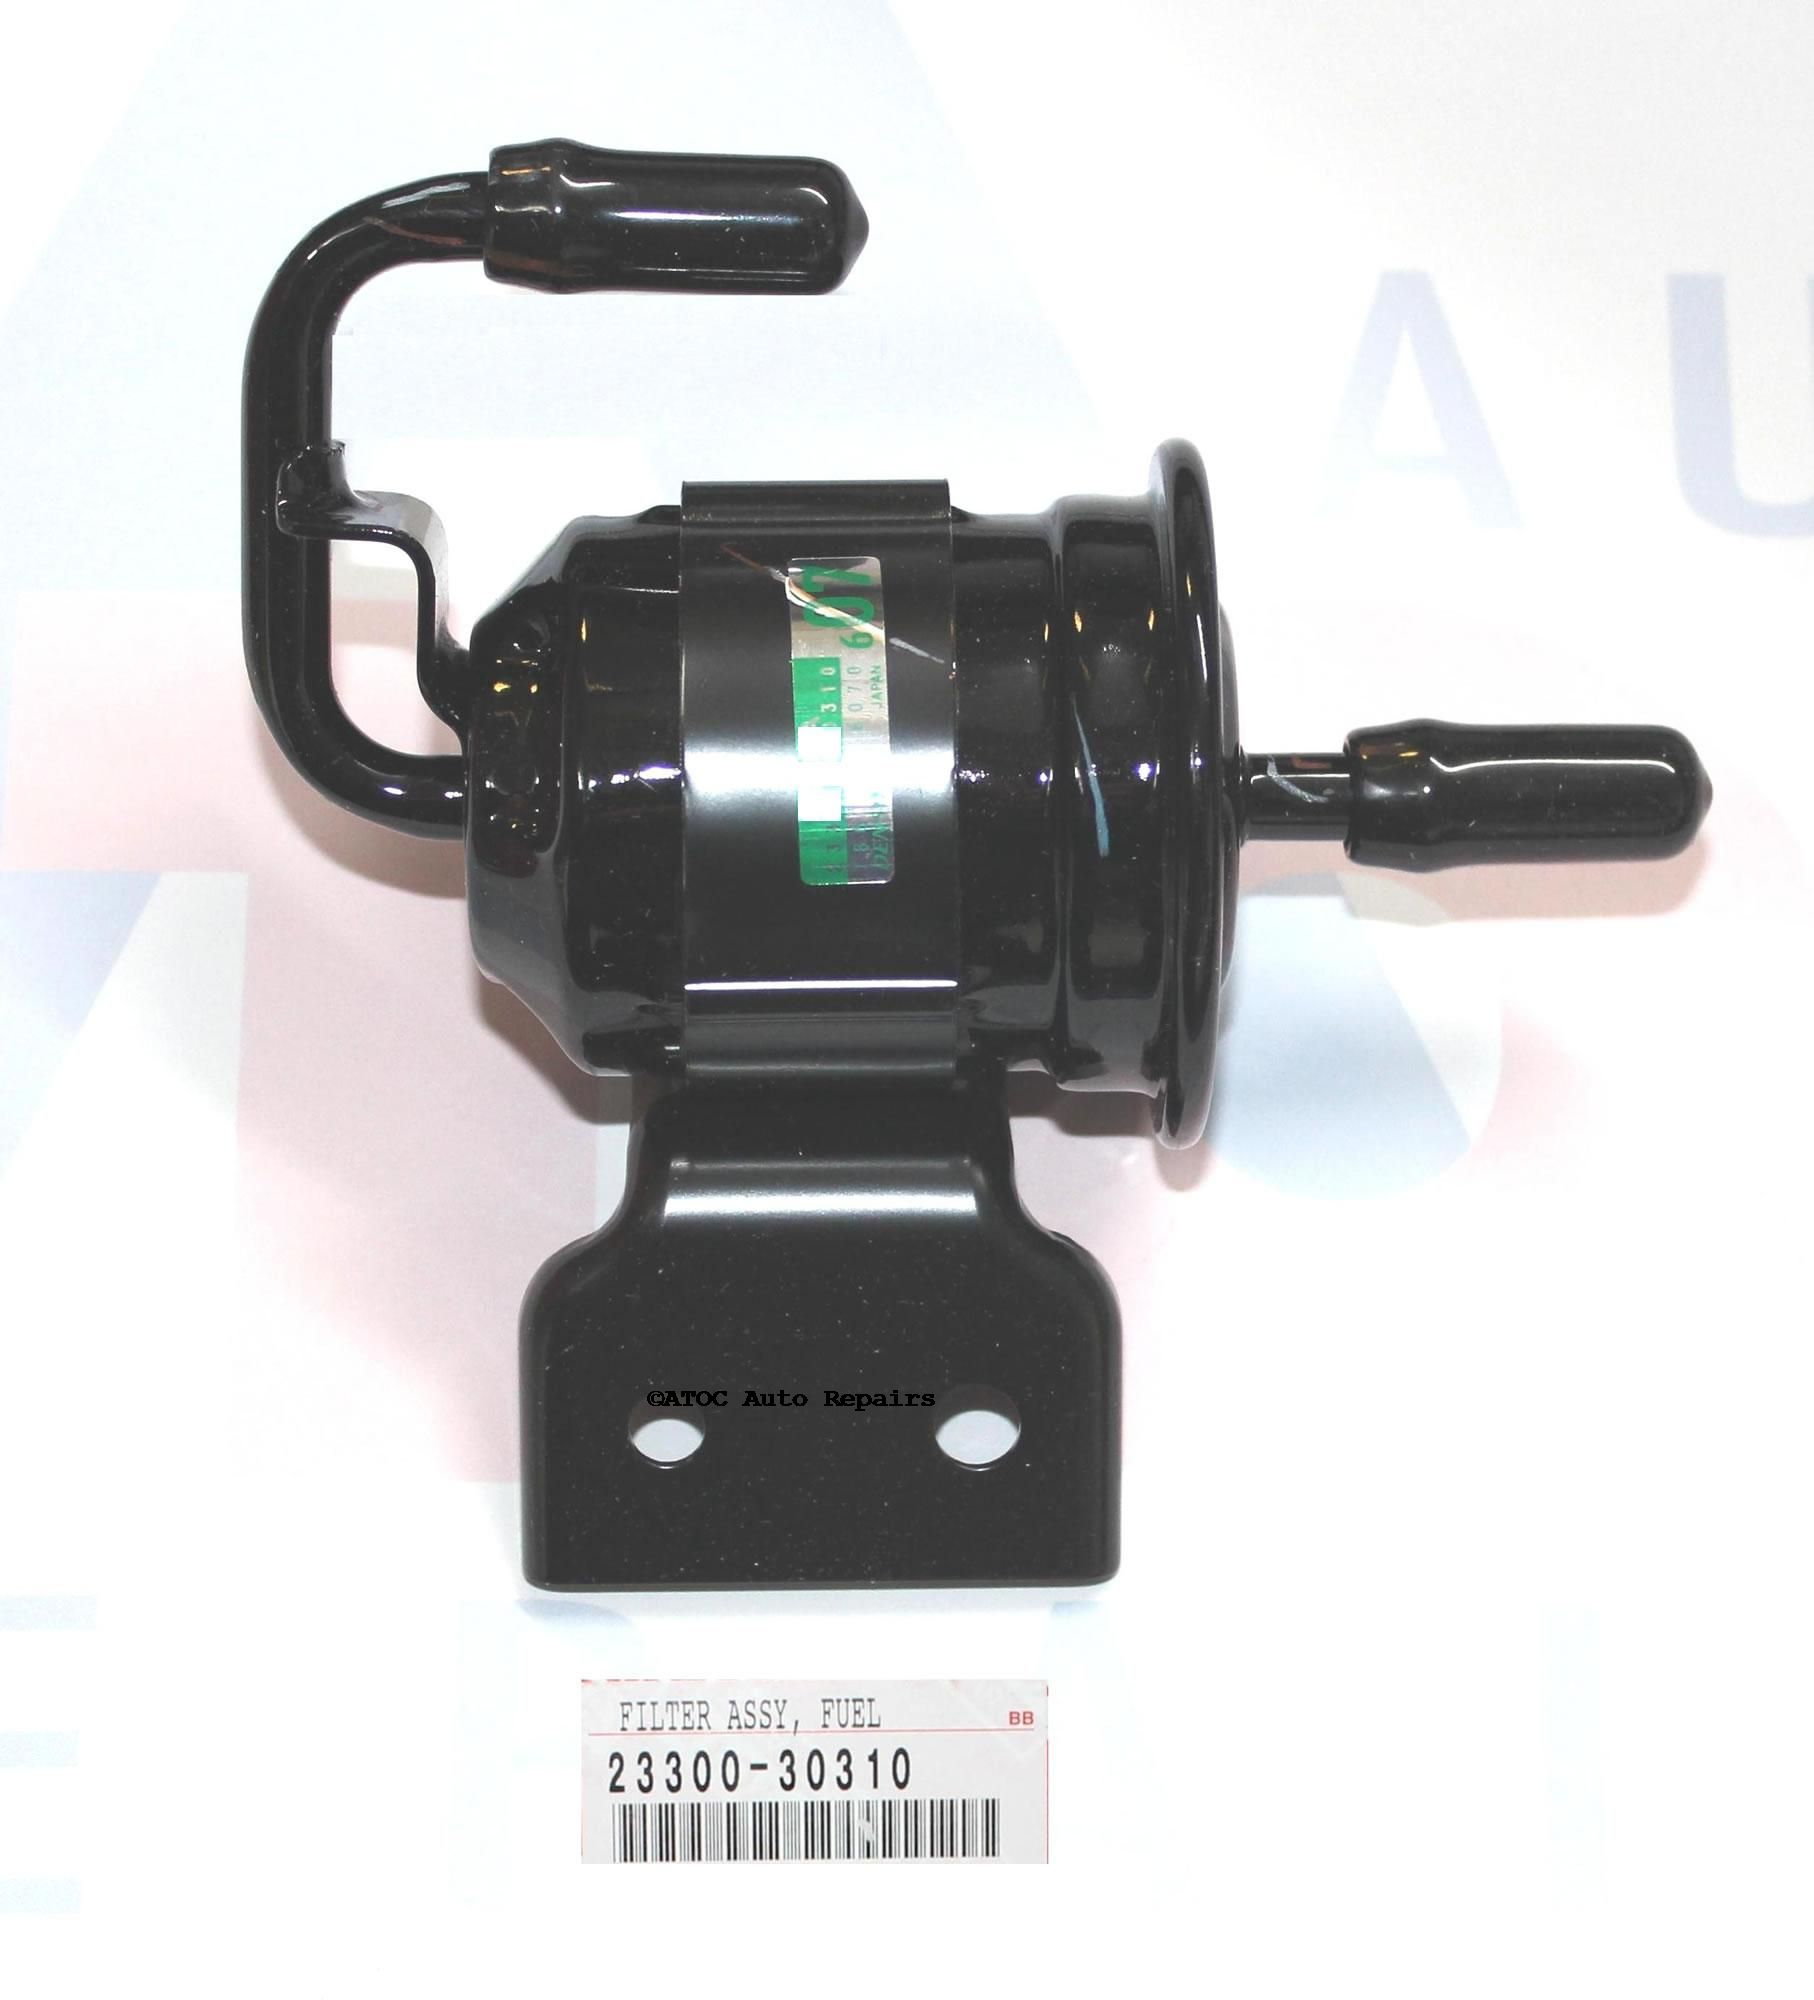 Oem Genuine Fuel Filter To Fit Prado Kdj120 Sub Tank Atoc